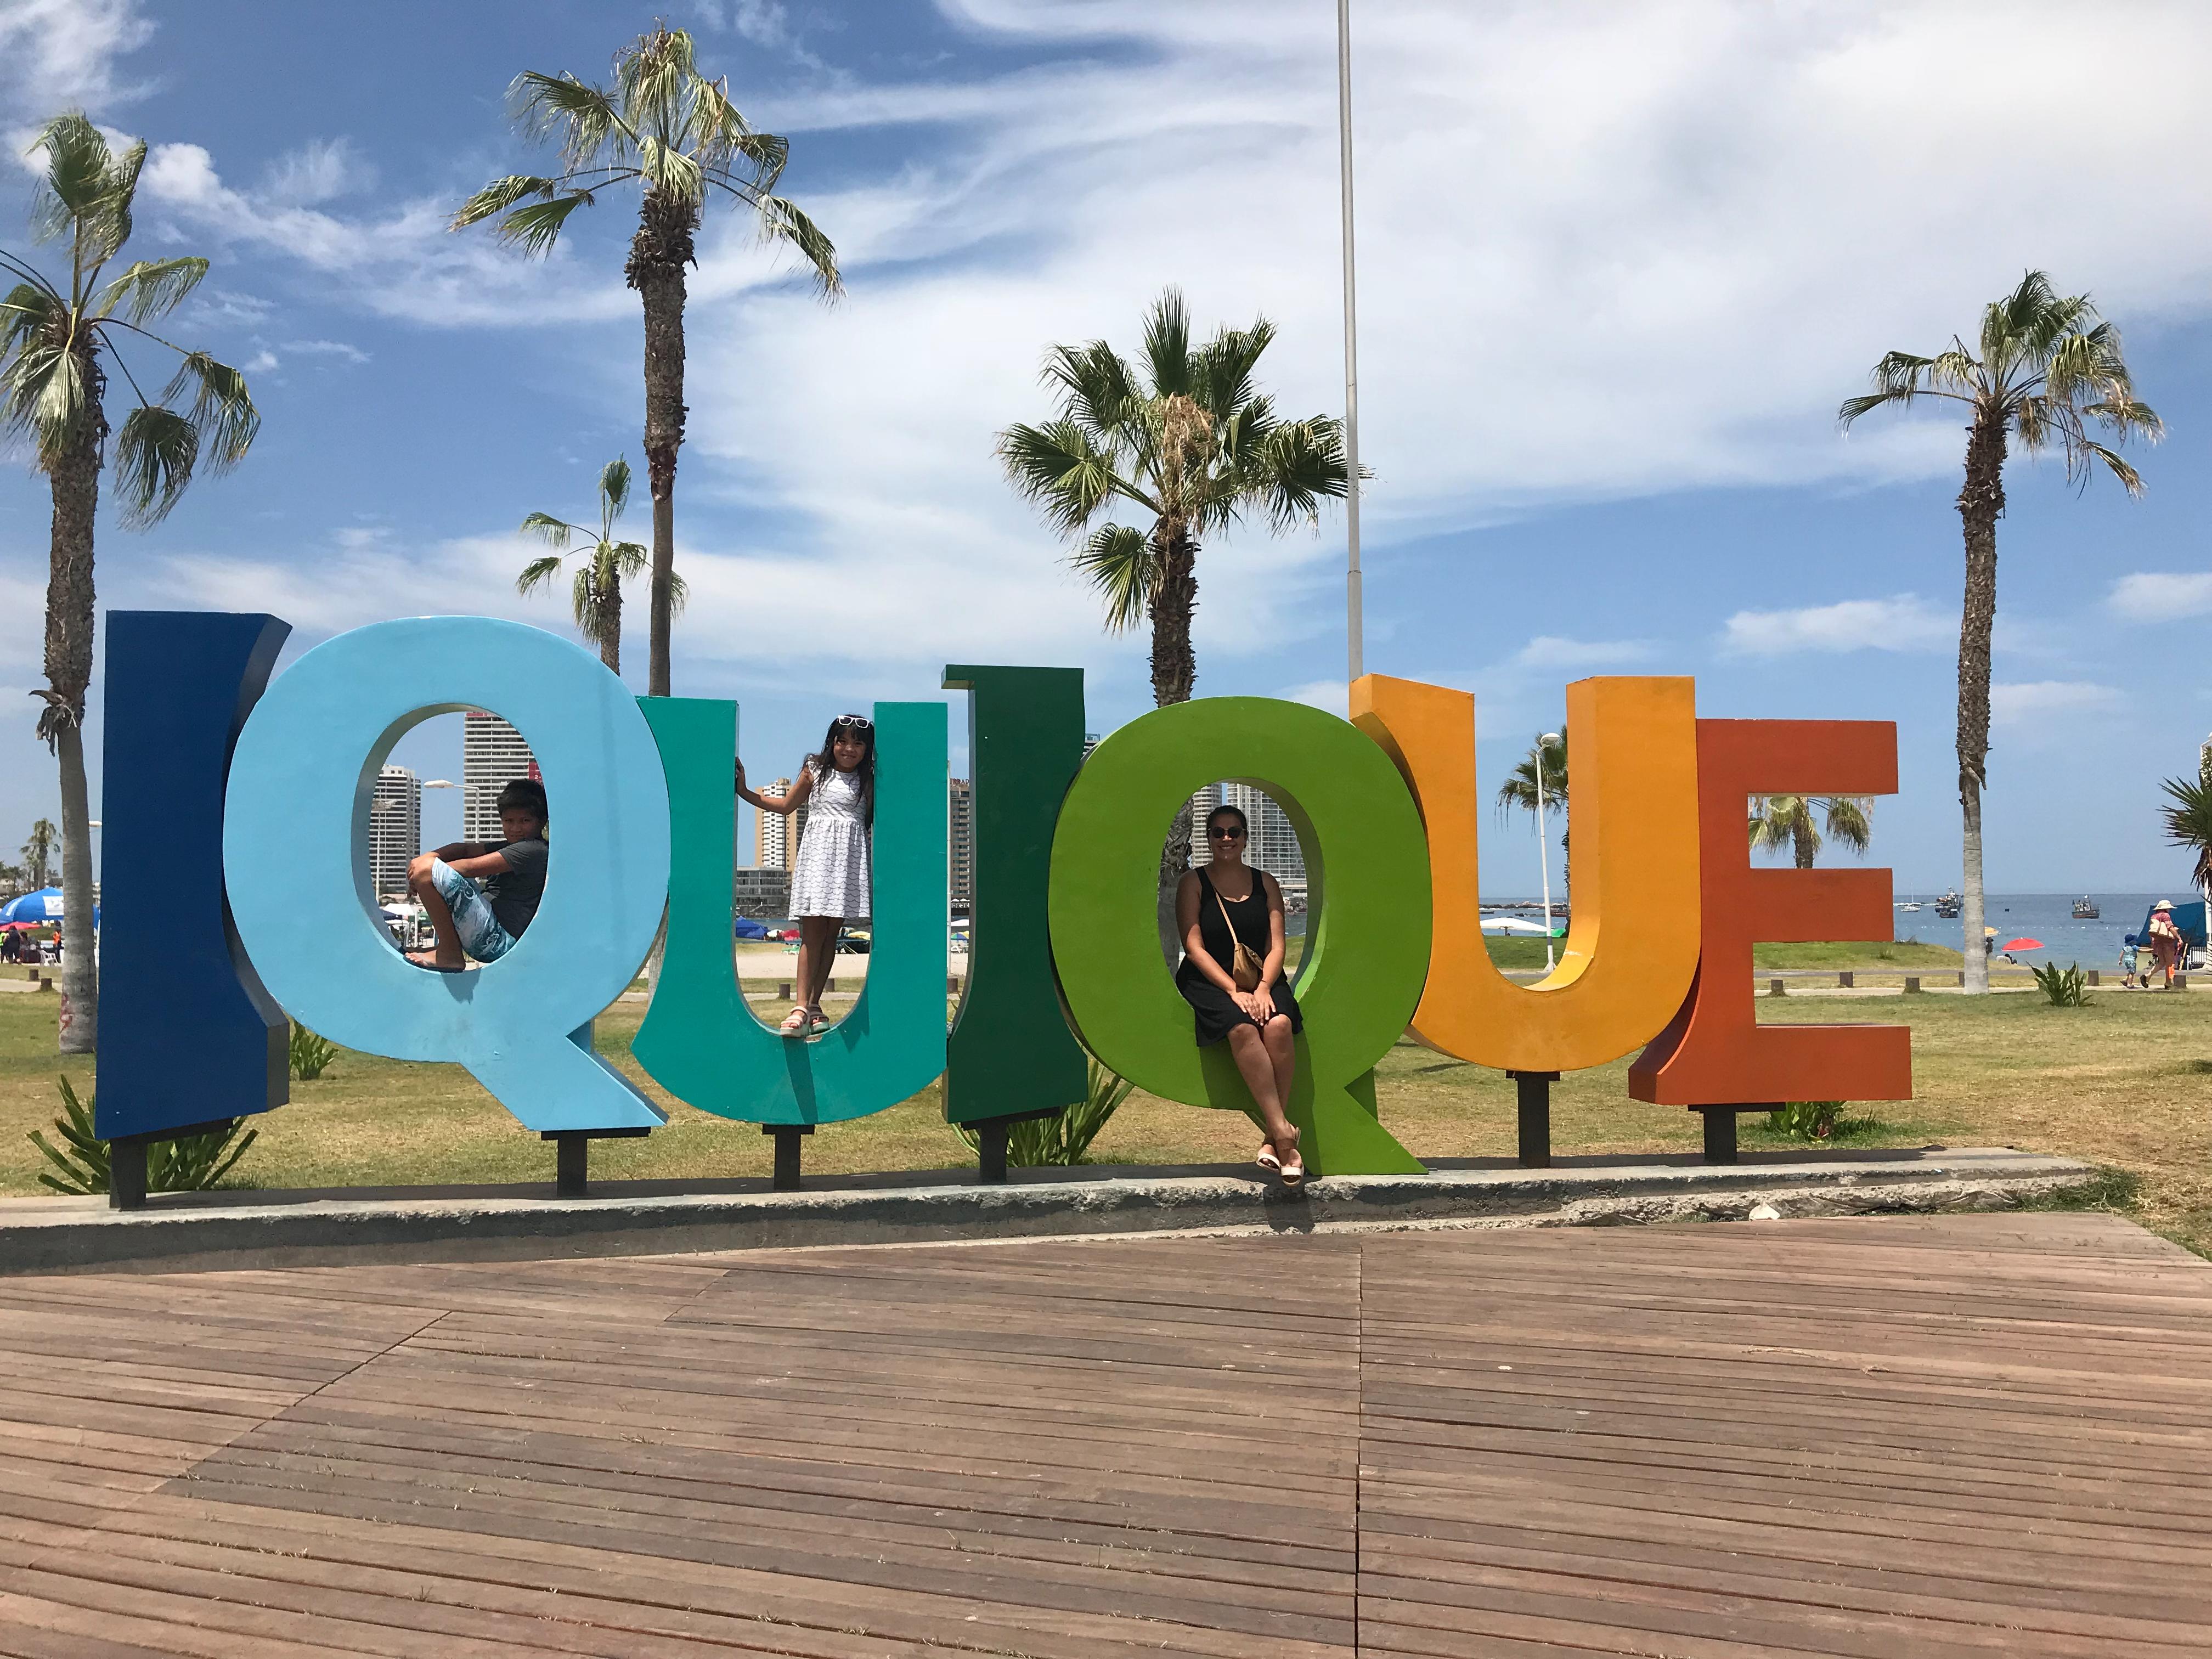 Iquique | Mi blog de aventuras | 2018